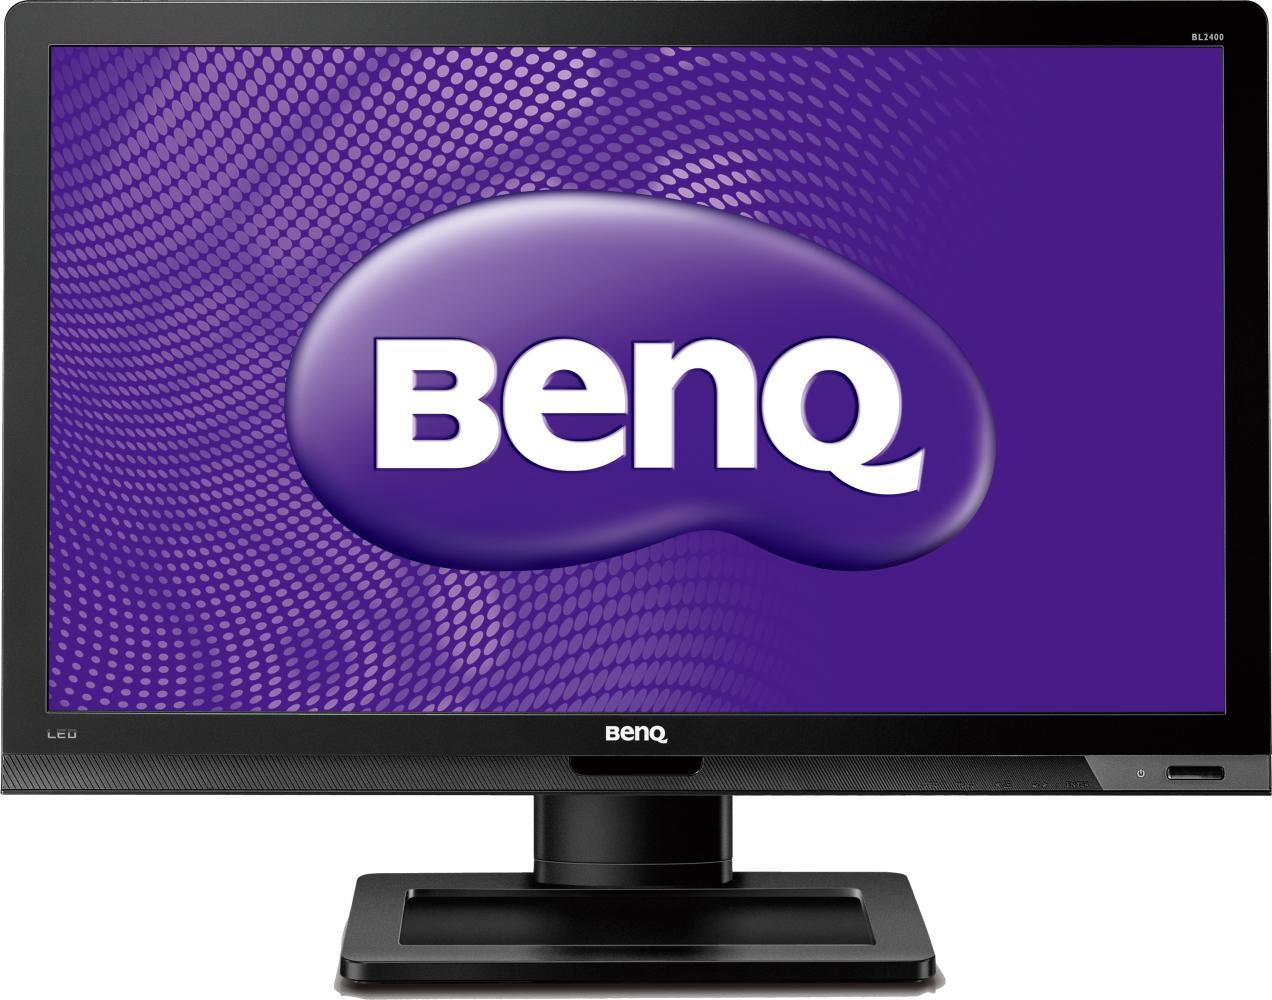 BenQ G2251M